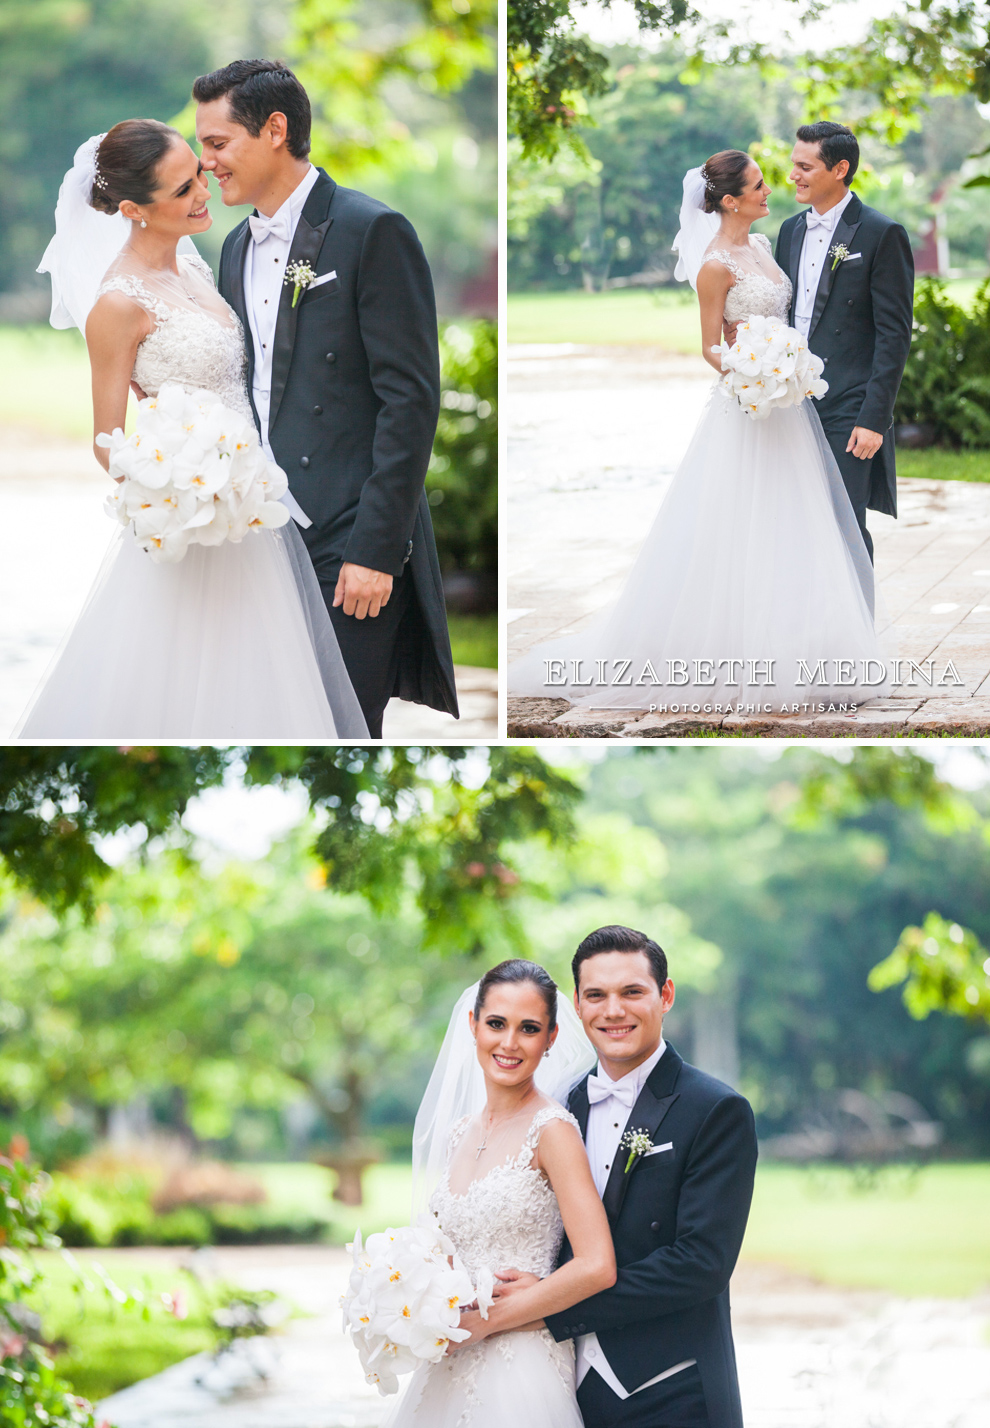 elizabeth_medina_merida_photographer_813_012 Lula and Daniel, Hacienda San Diego Cutz Wedding